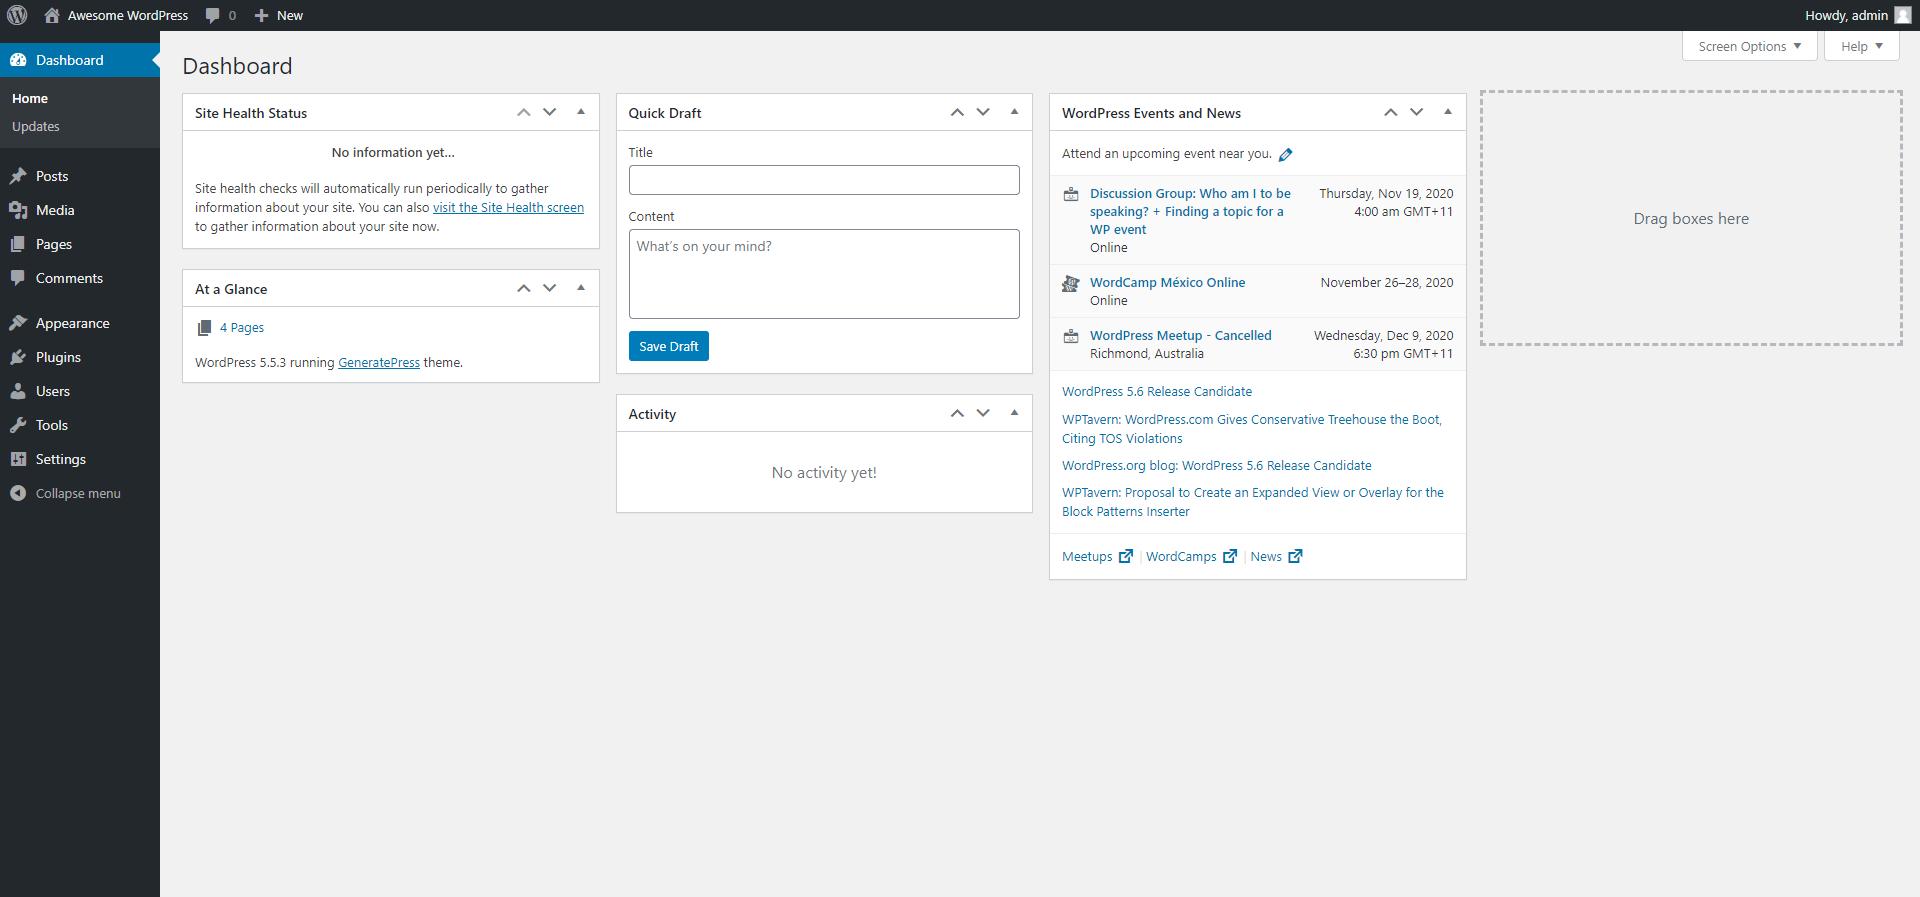 WordPress Dashboard Home